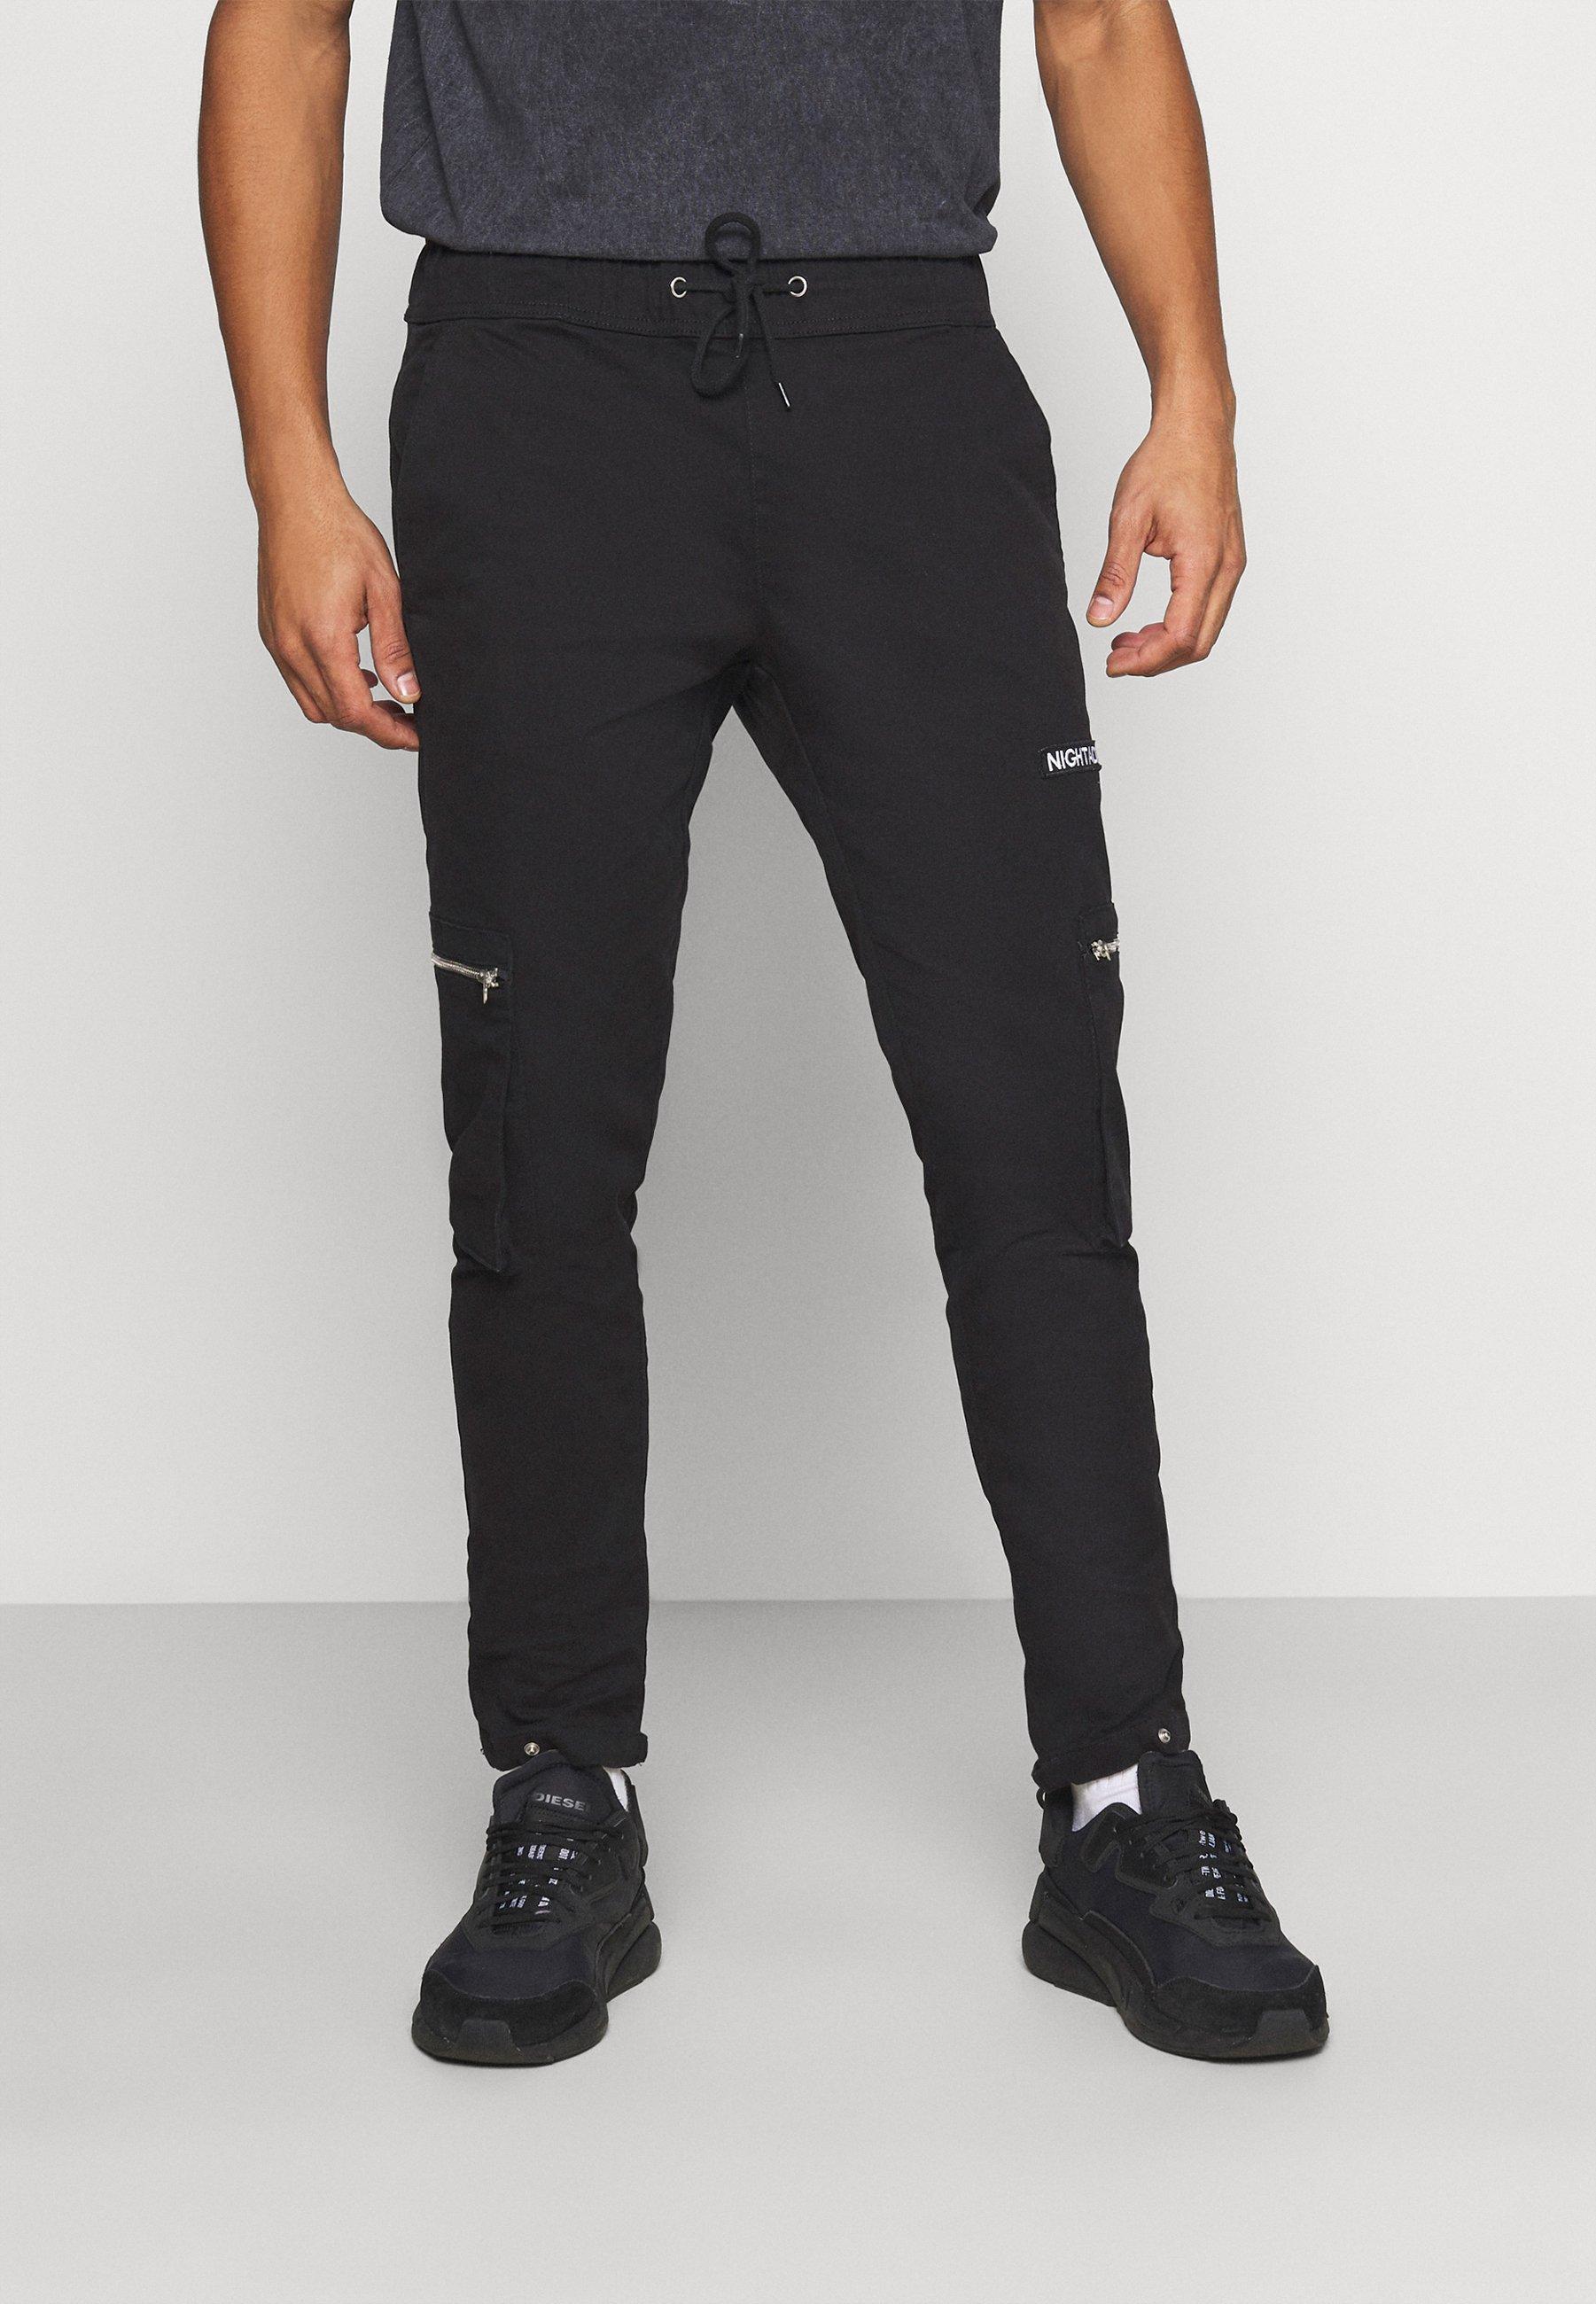 Homme NAASTRID - Pantalon cargo